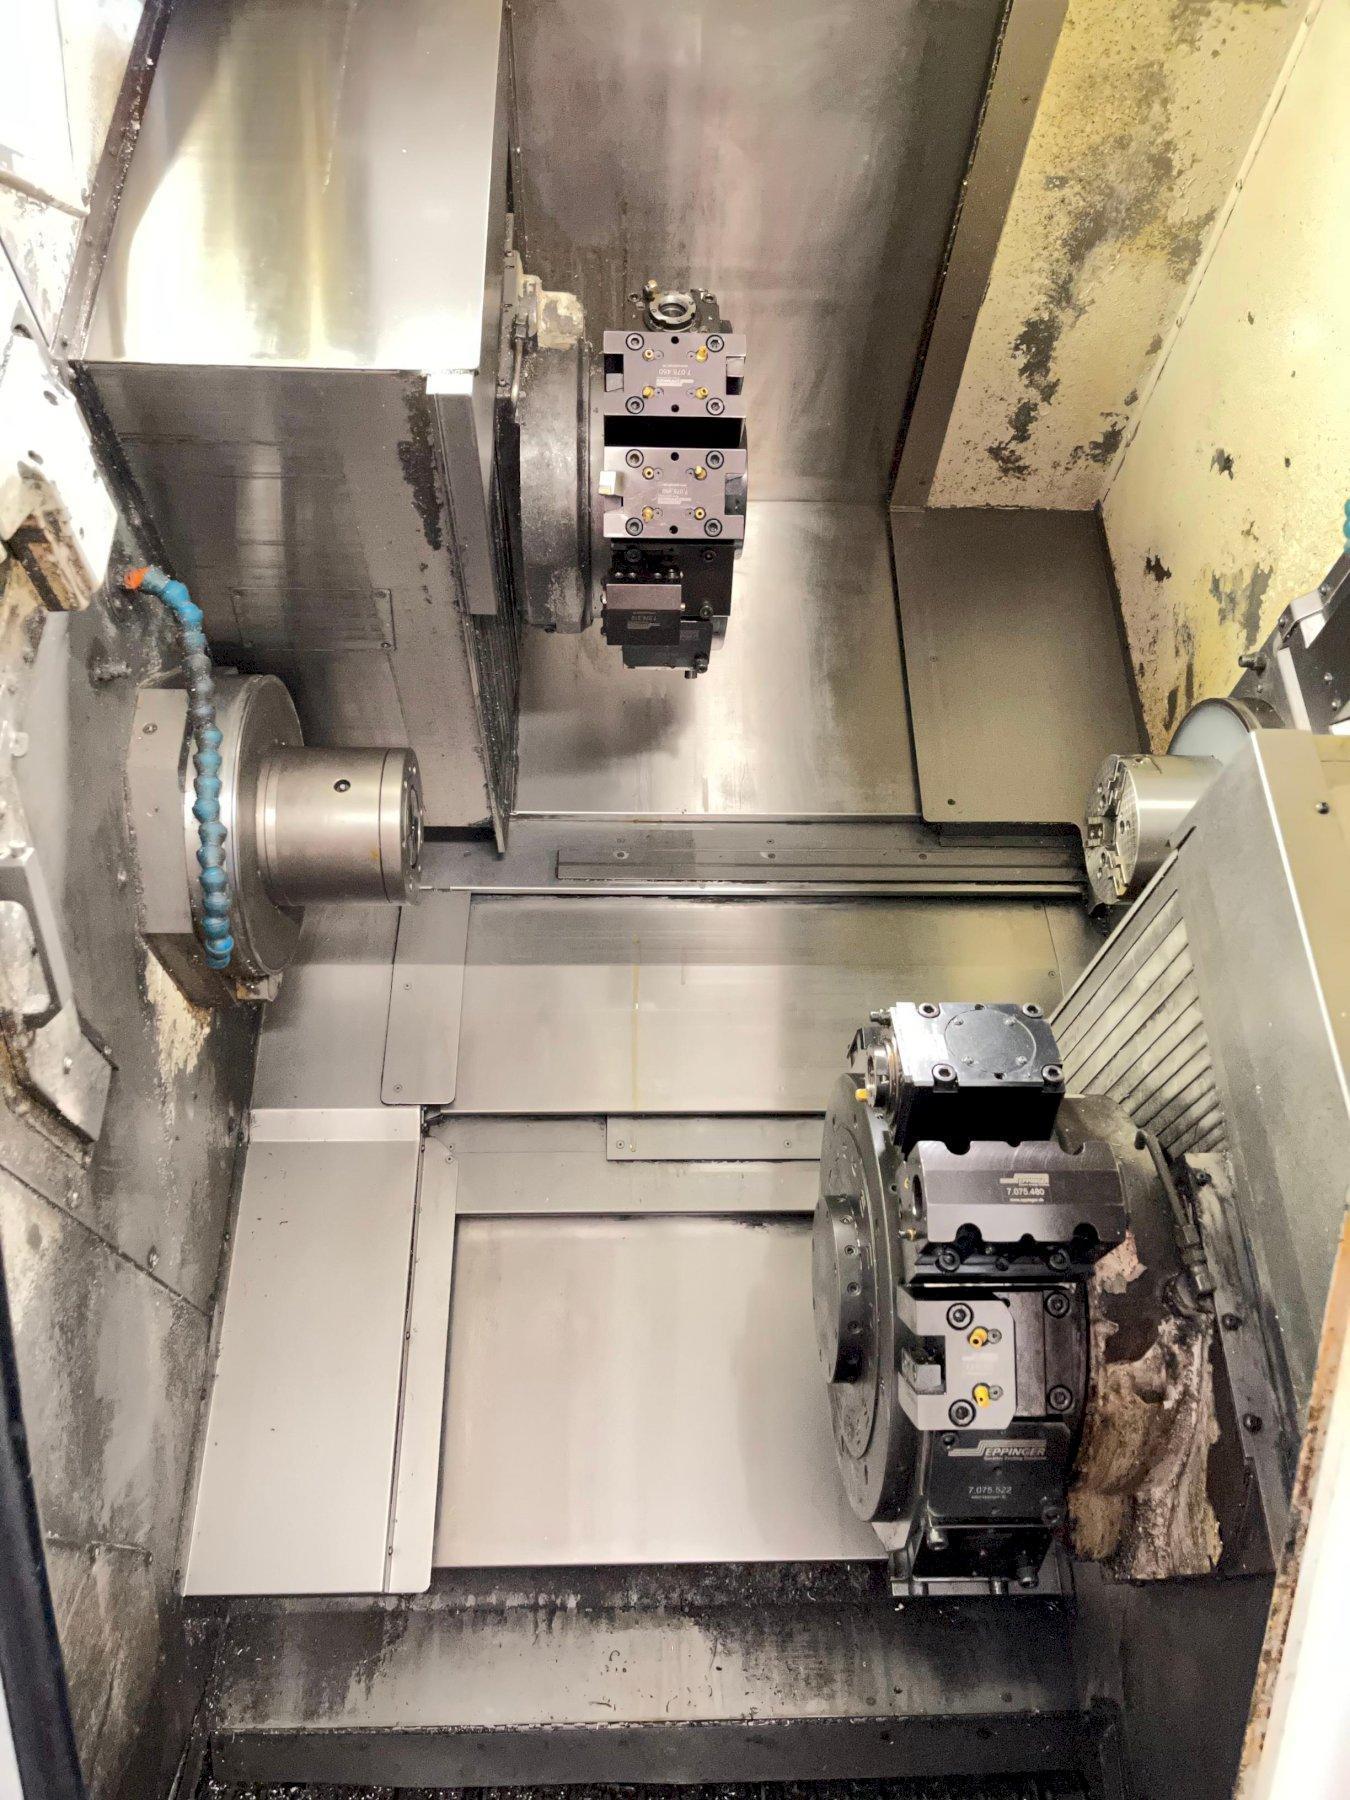 Okuma LT2000 Ex Twin Star CNC Twin Spindle Turning Centre (2012)